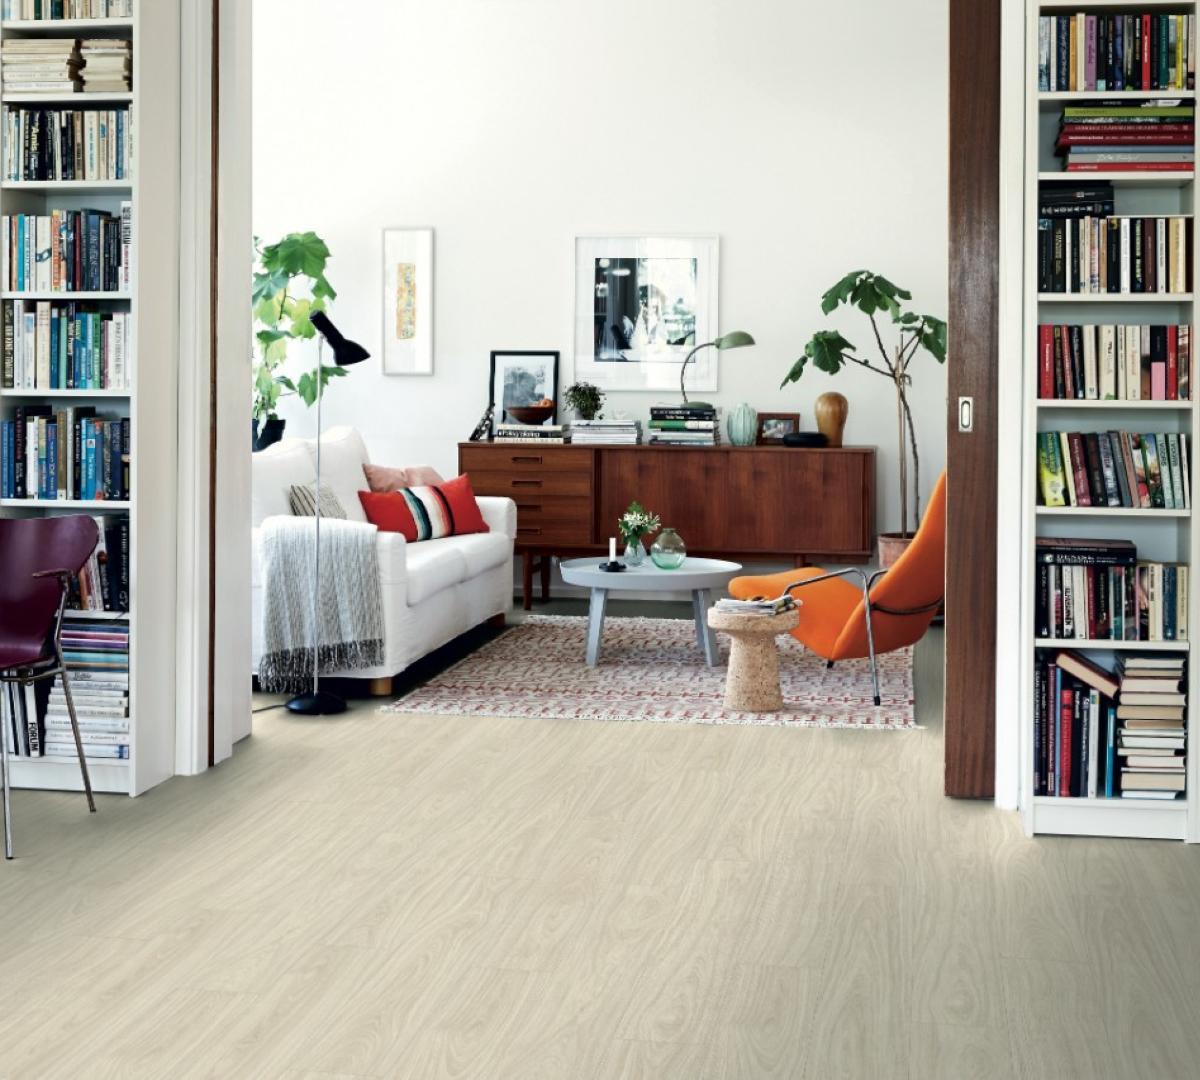 Кварцвиниловая плитка Pergo Optimum Classic Plank Glue v3201-40020 Дуб Нордик Белый (1256*187*2,5)